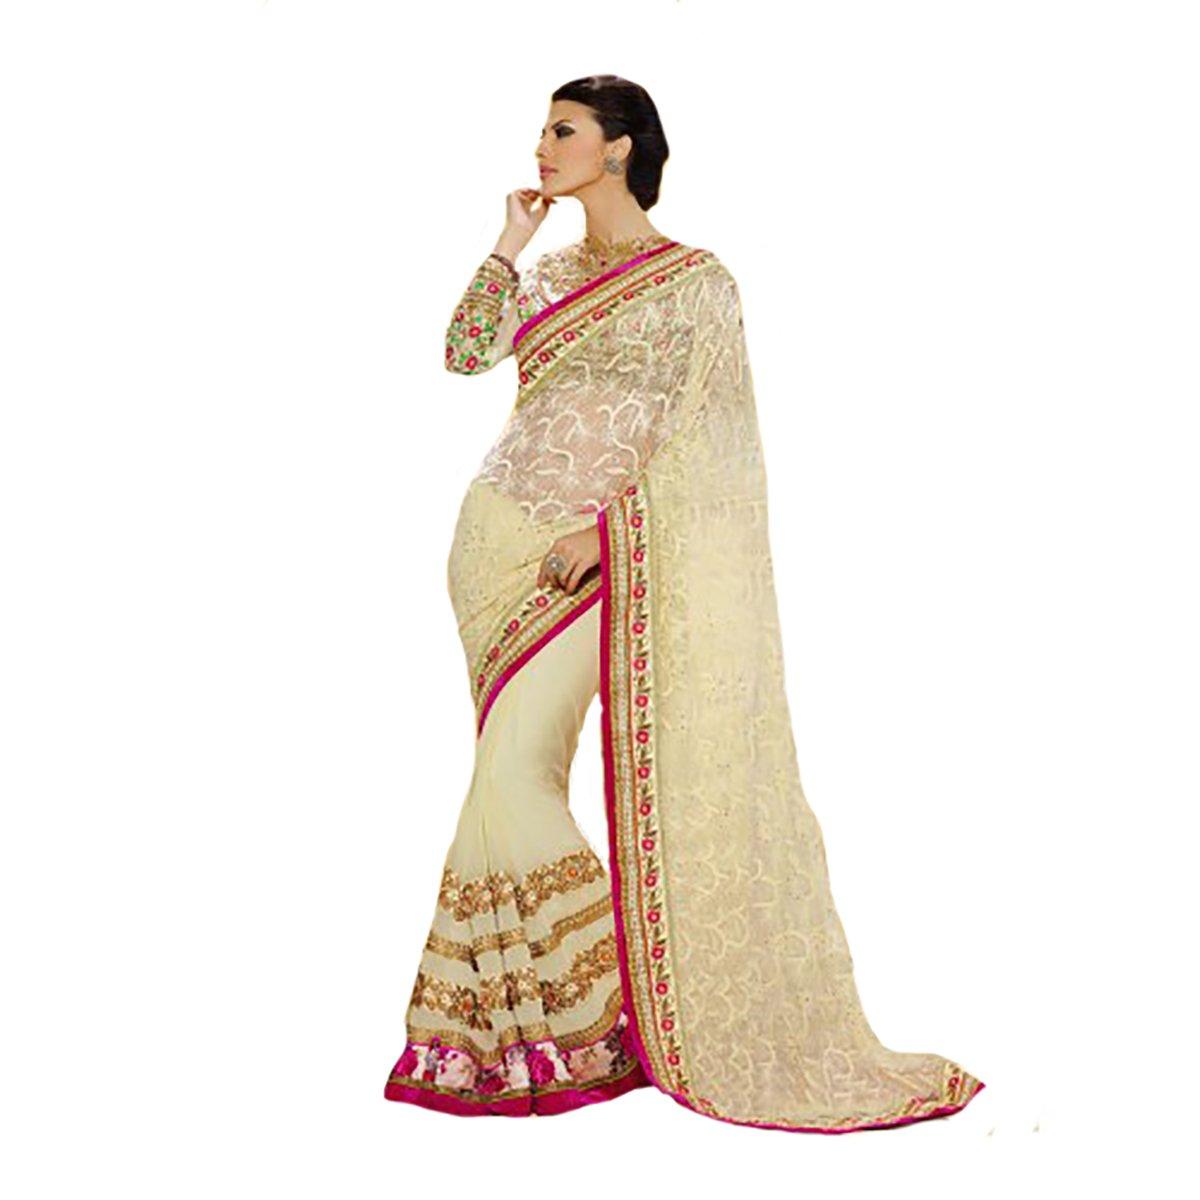 Designer Work Original Ethnic Bollywood Indian Bridal Wedding Sari Saree Traditional White Sexy 8308